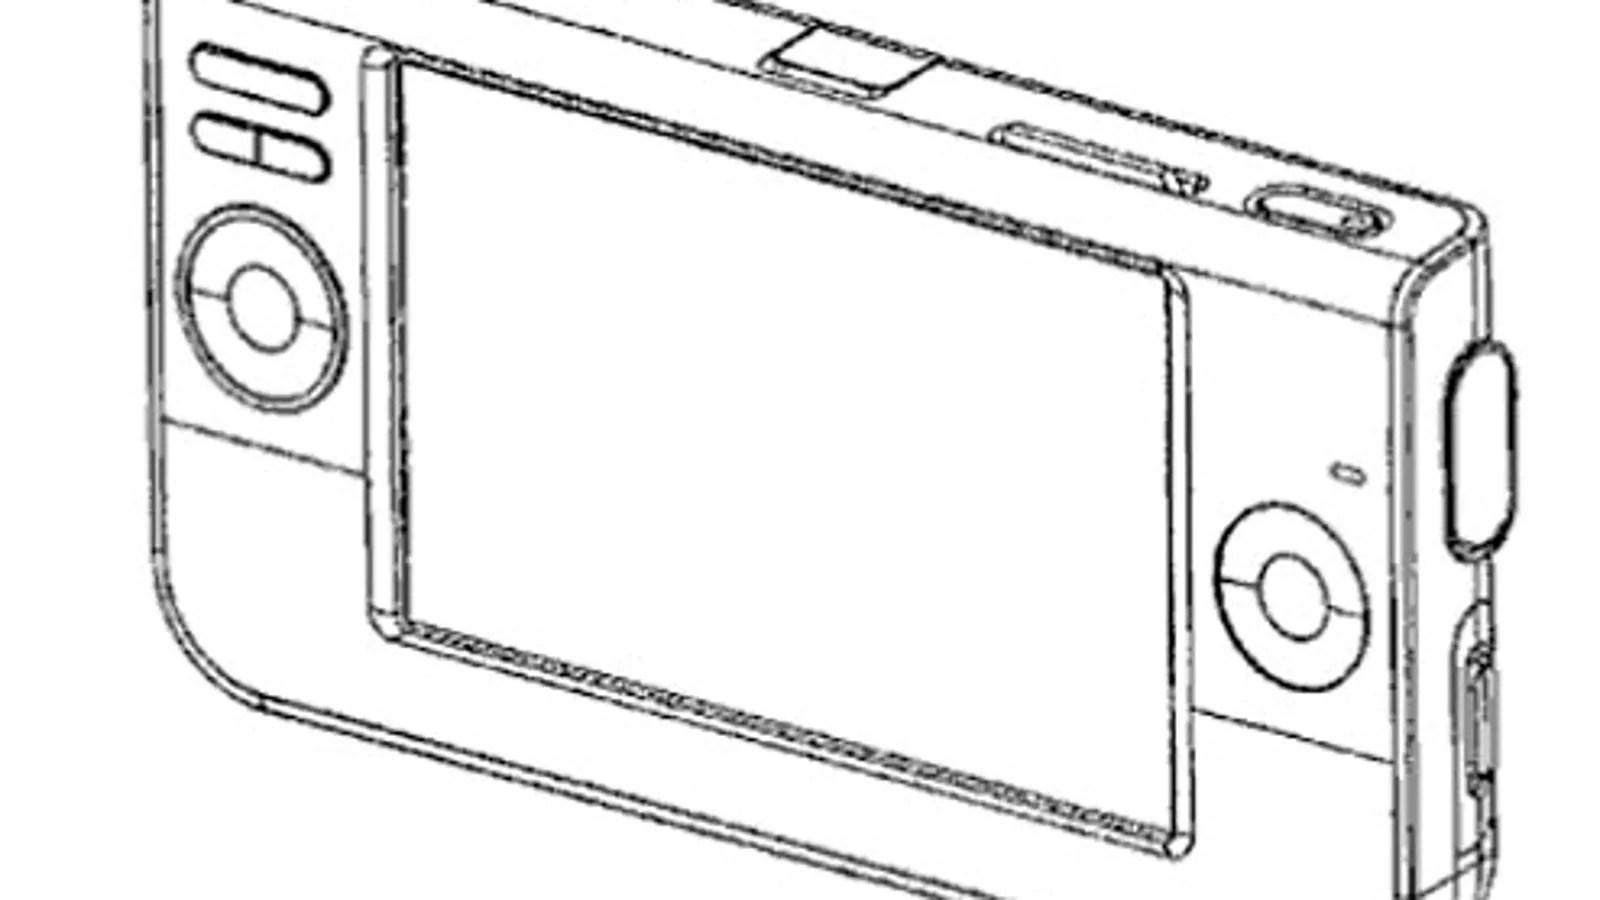 Creative Patent Looks Like an Internet Tablet, Digital